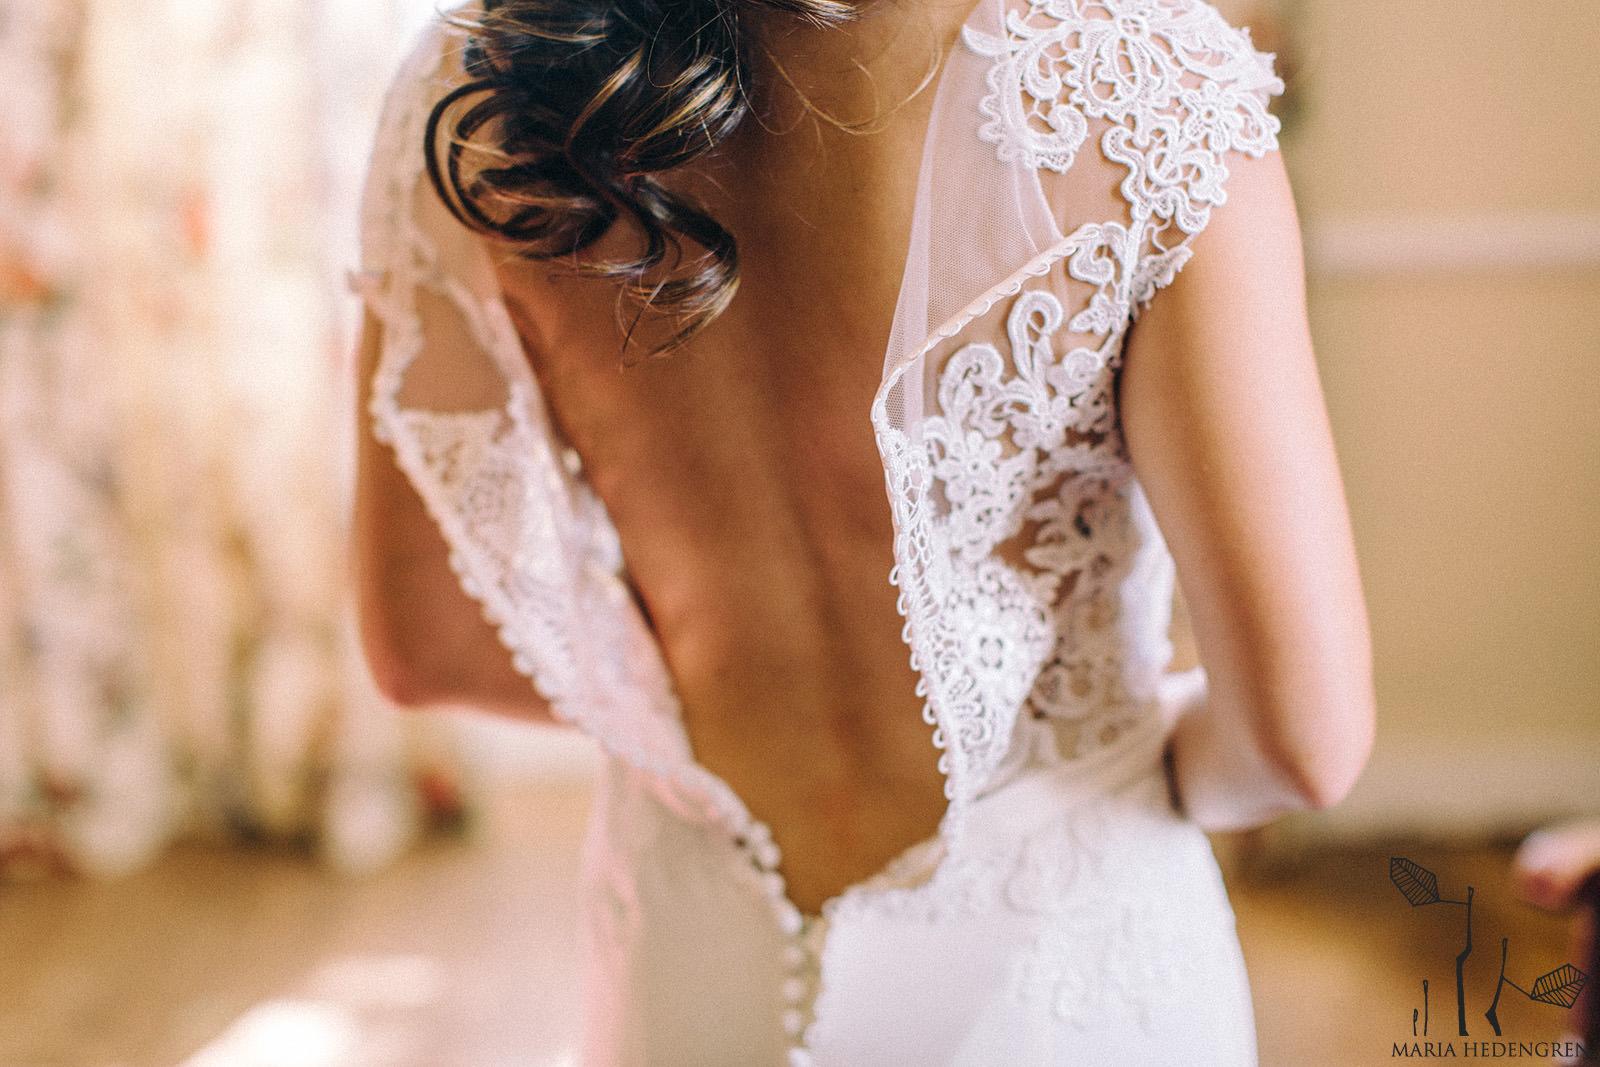 bride puttin on her gown